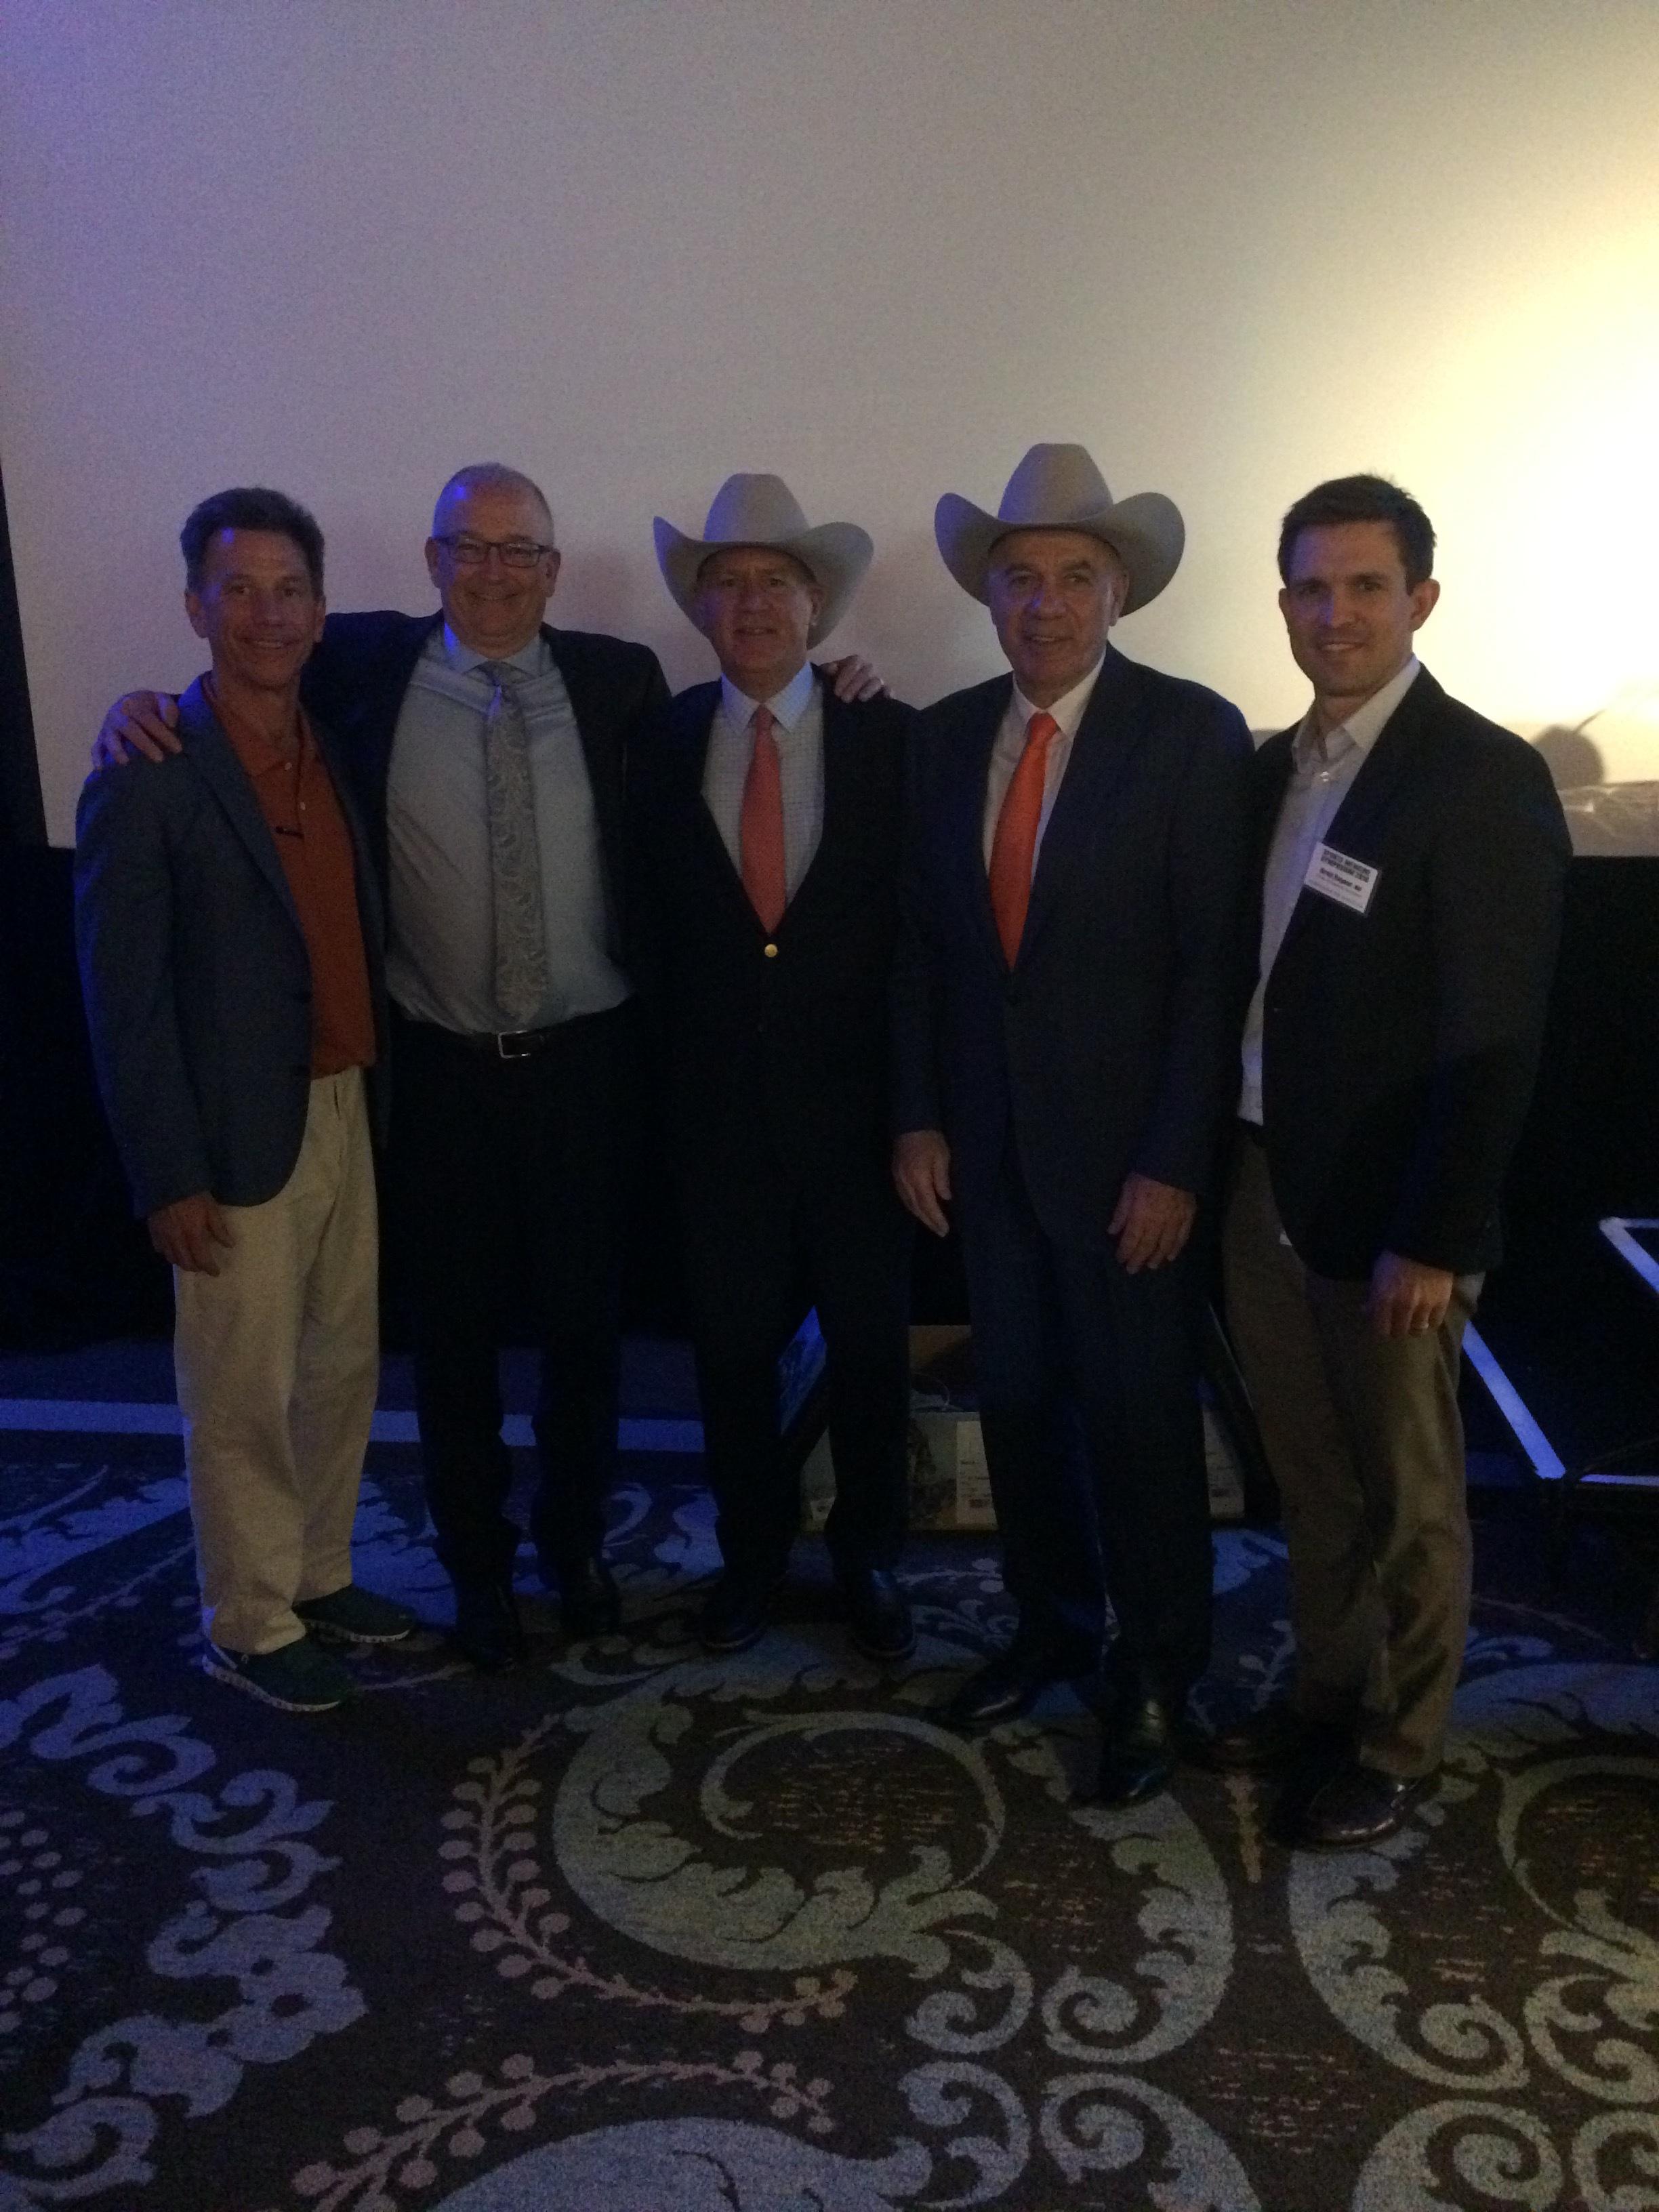 Dr. Singleton, Dr. Walter, Dr. Mandelbaum, Dr. Popovic, and Dr. Raynor